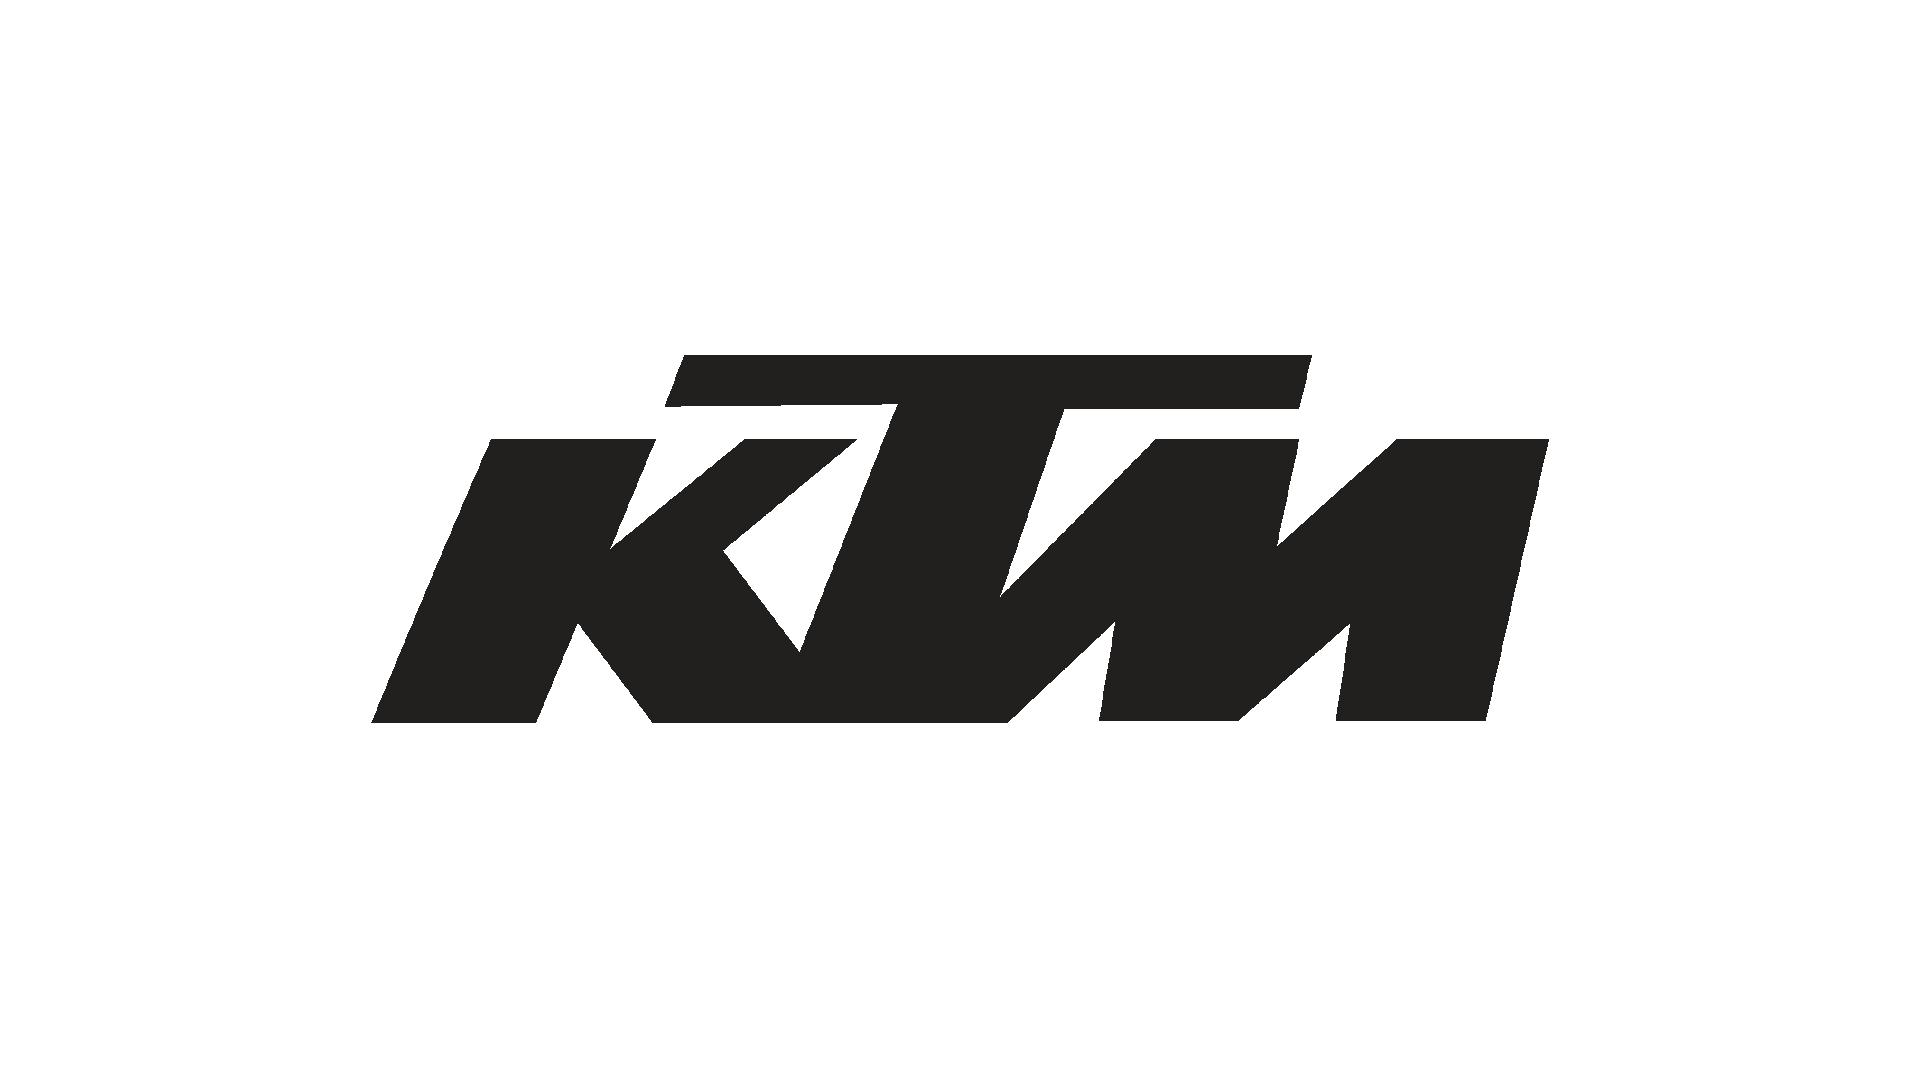 KTM-logo-1920x1080.png